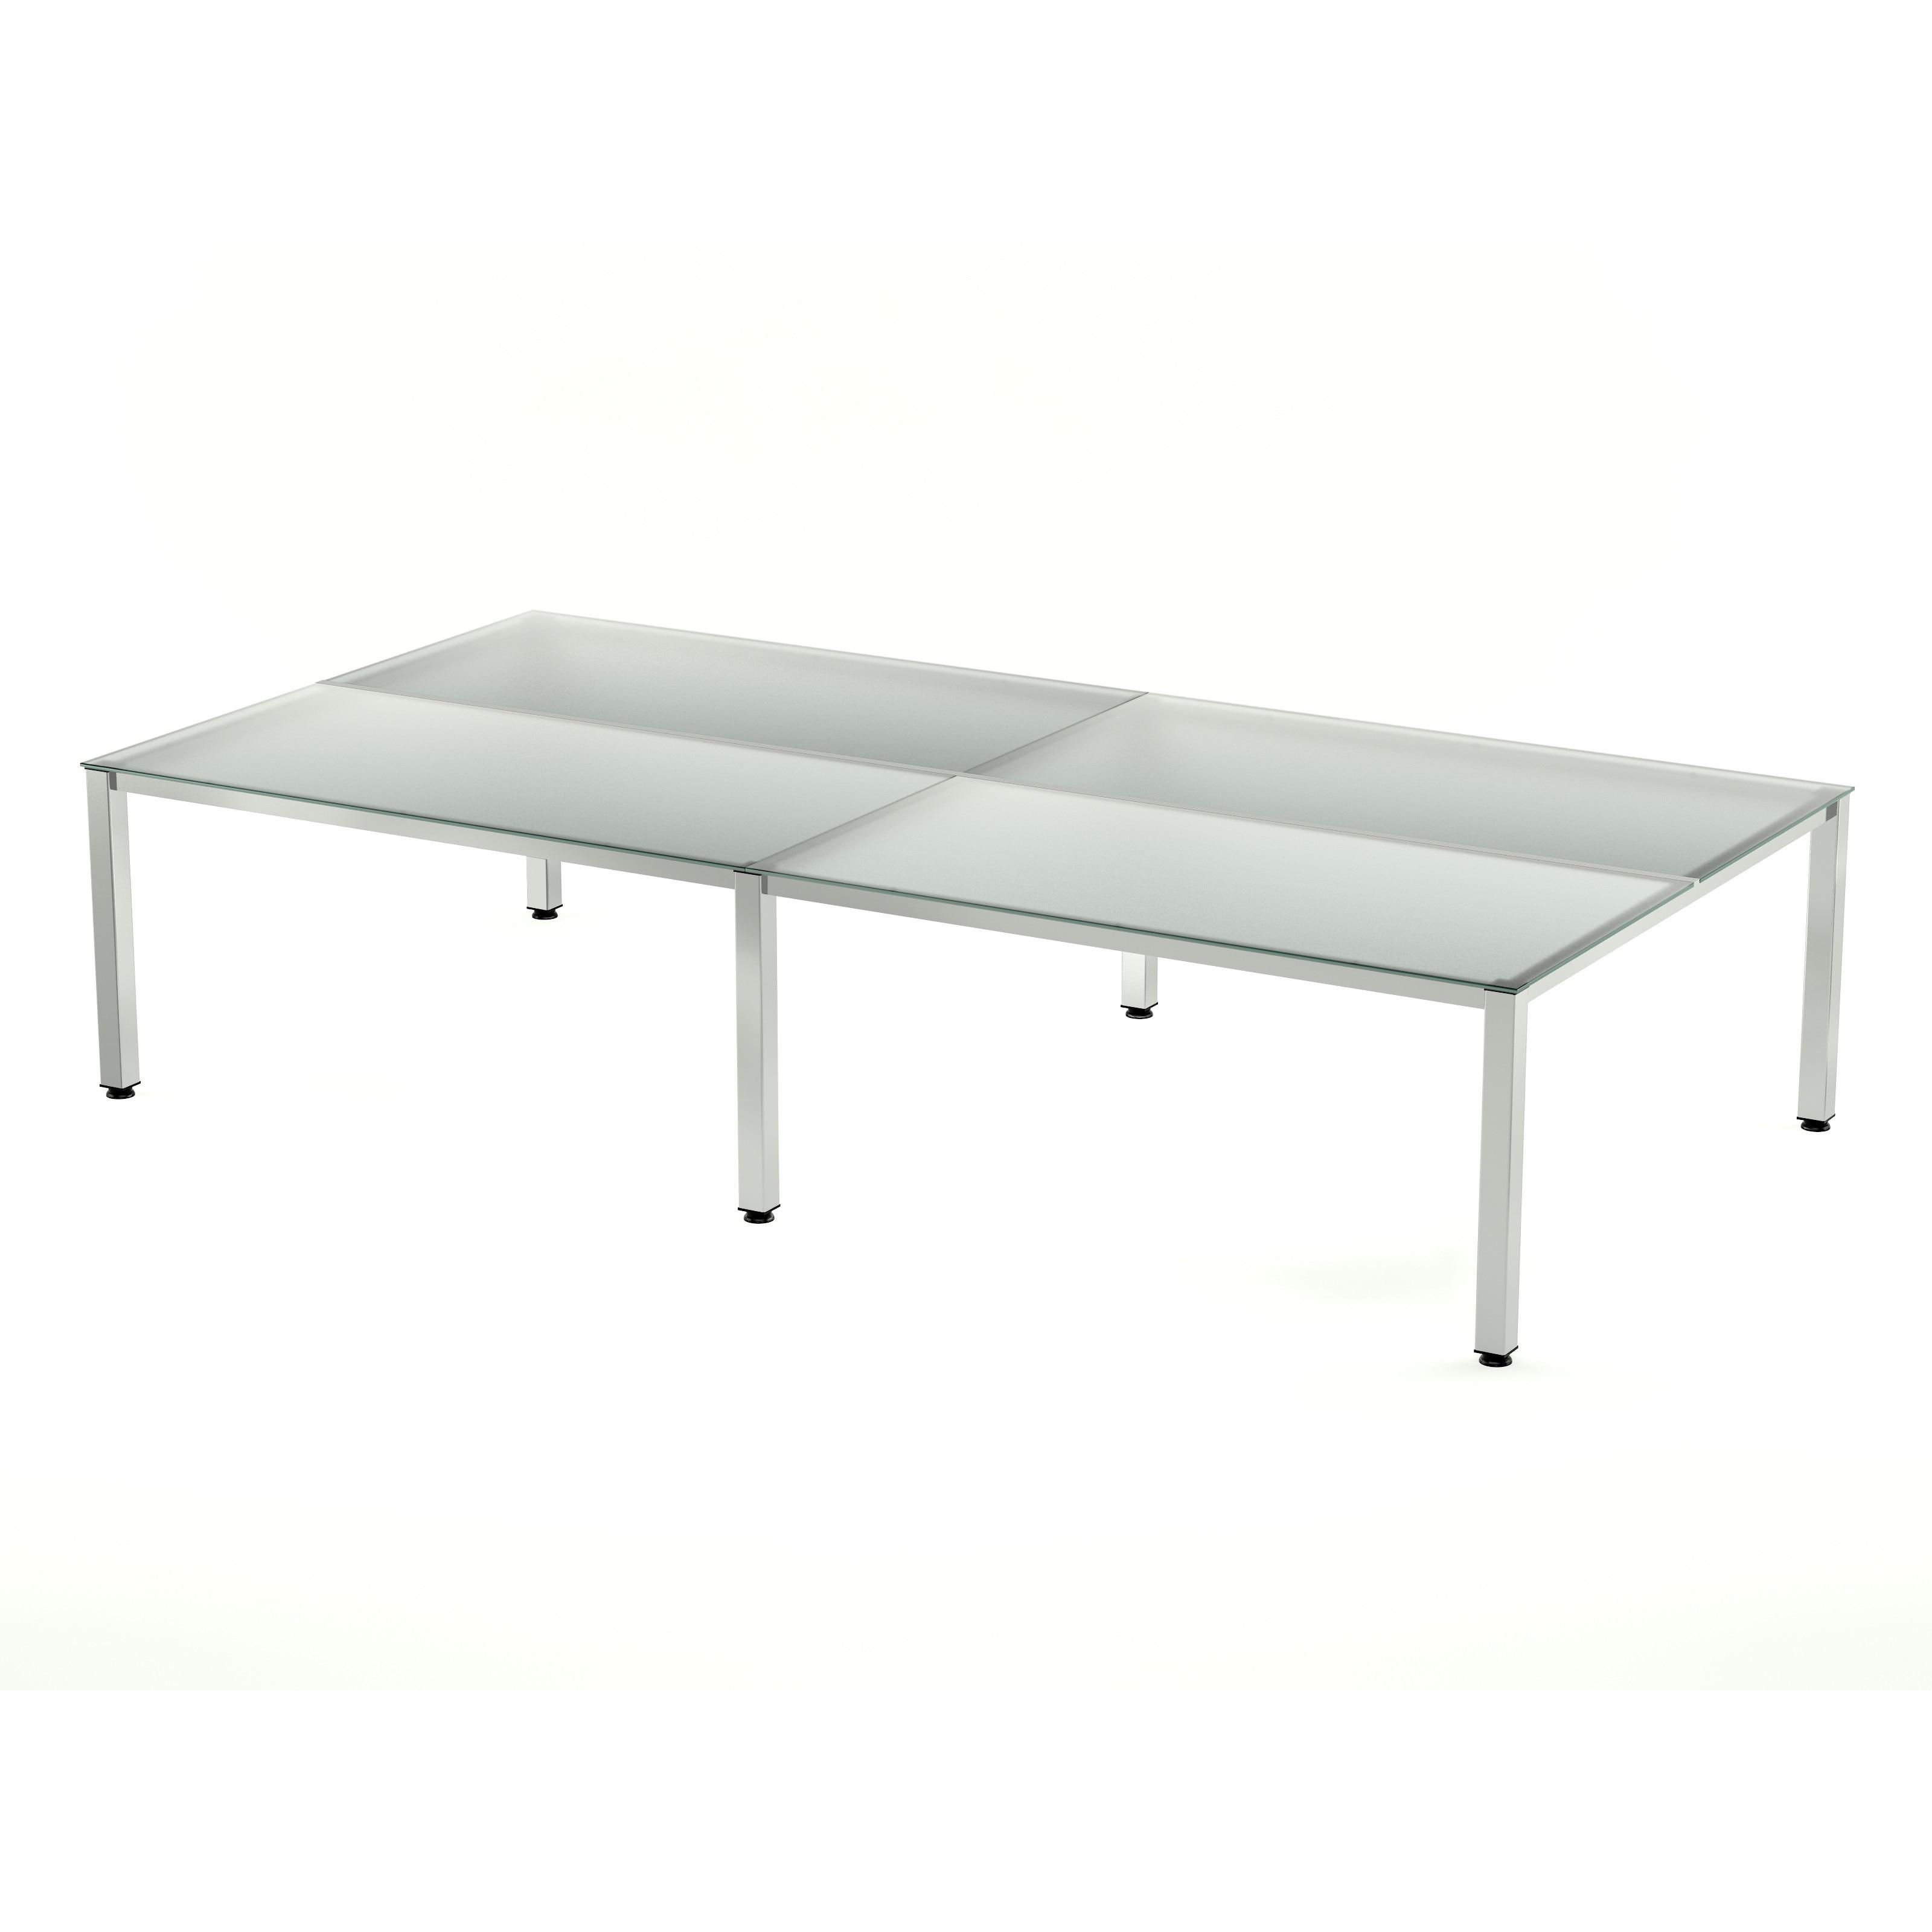 TABLE DE OFFICE QUADRUPLE (4 POSTS) EXECUTIVE SERIES 320x163 CHROME/CRYSTAL